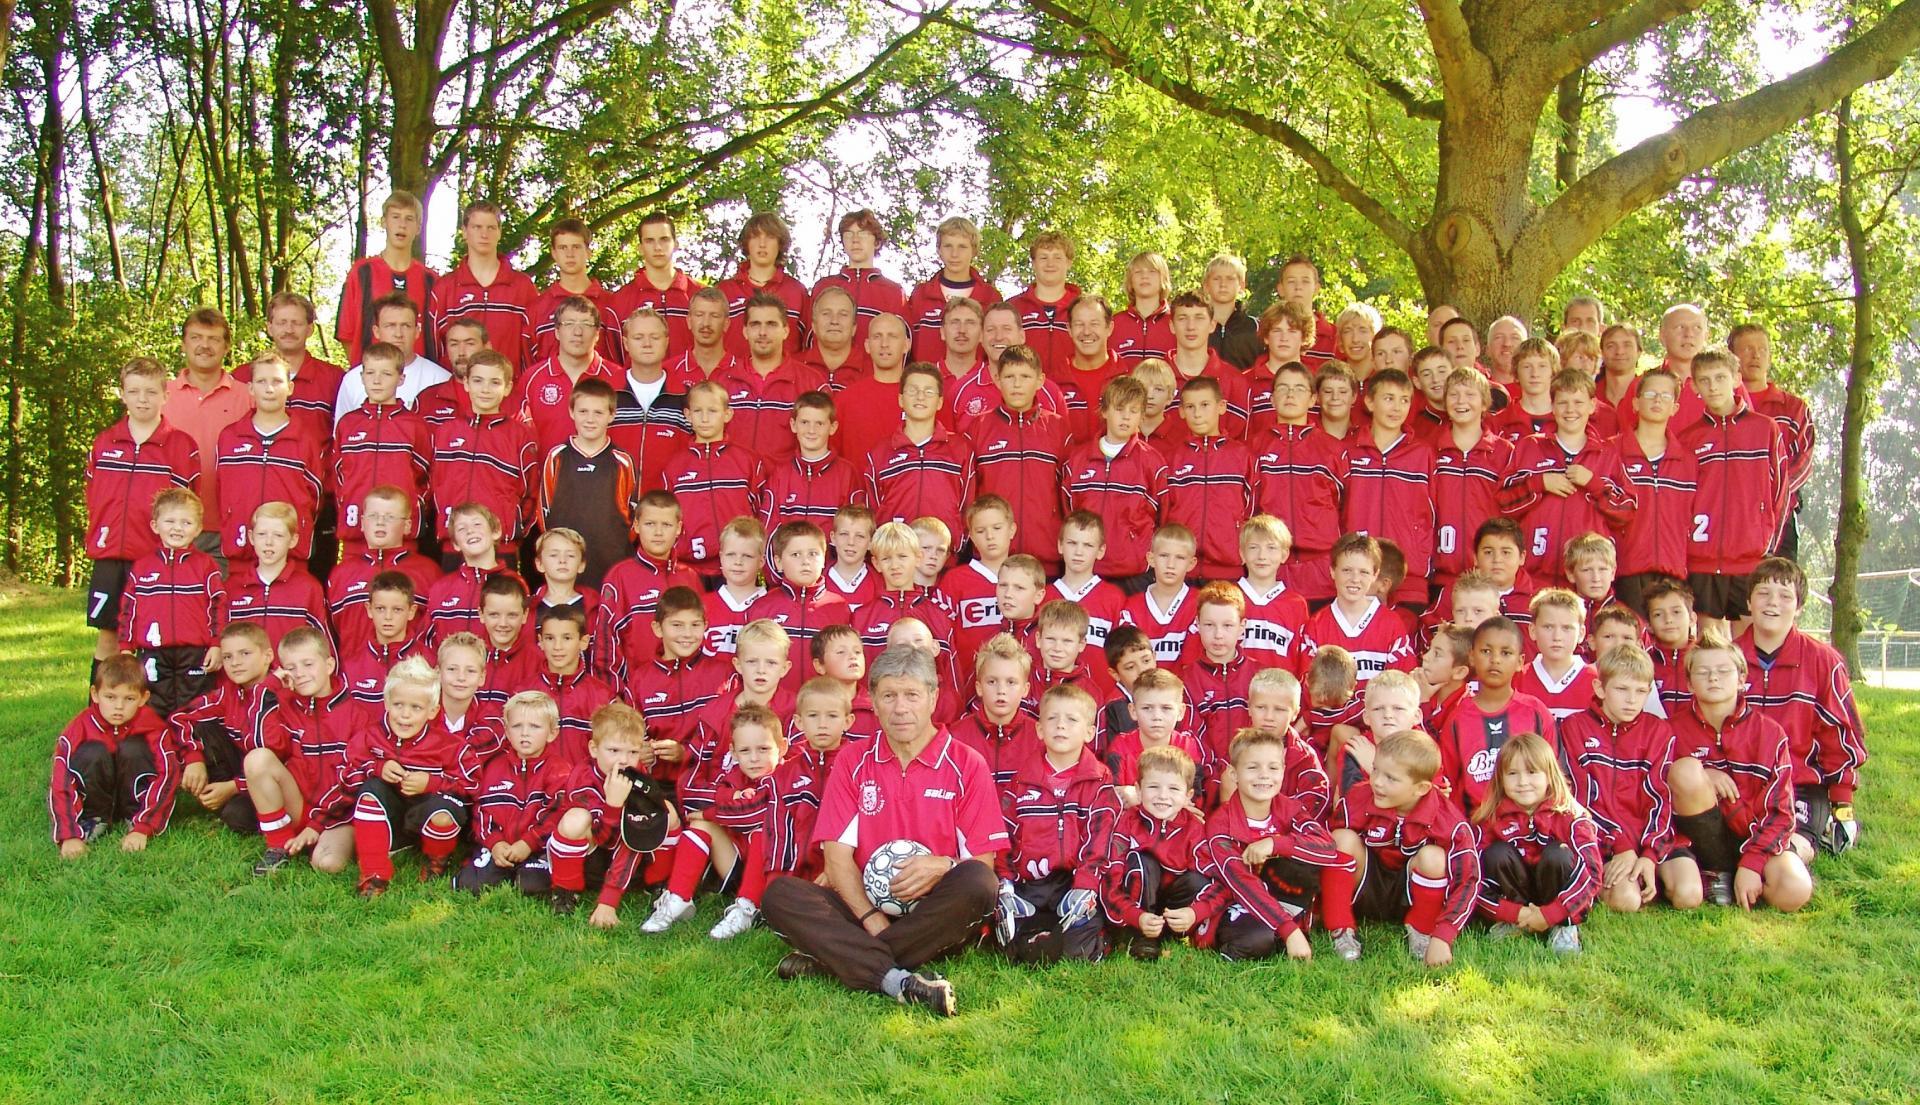 gesamte Jugendabteilung 2005